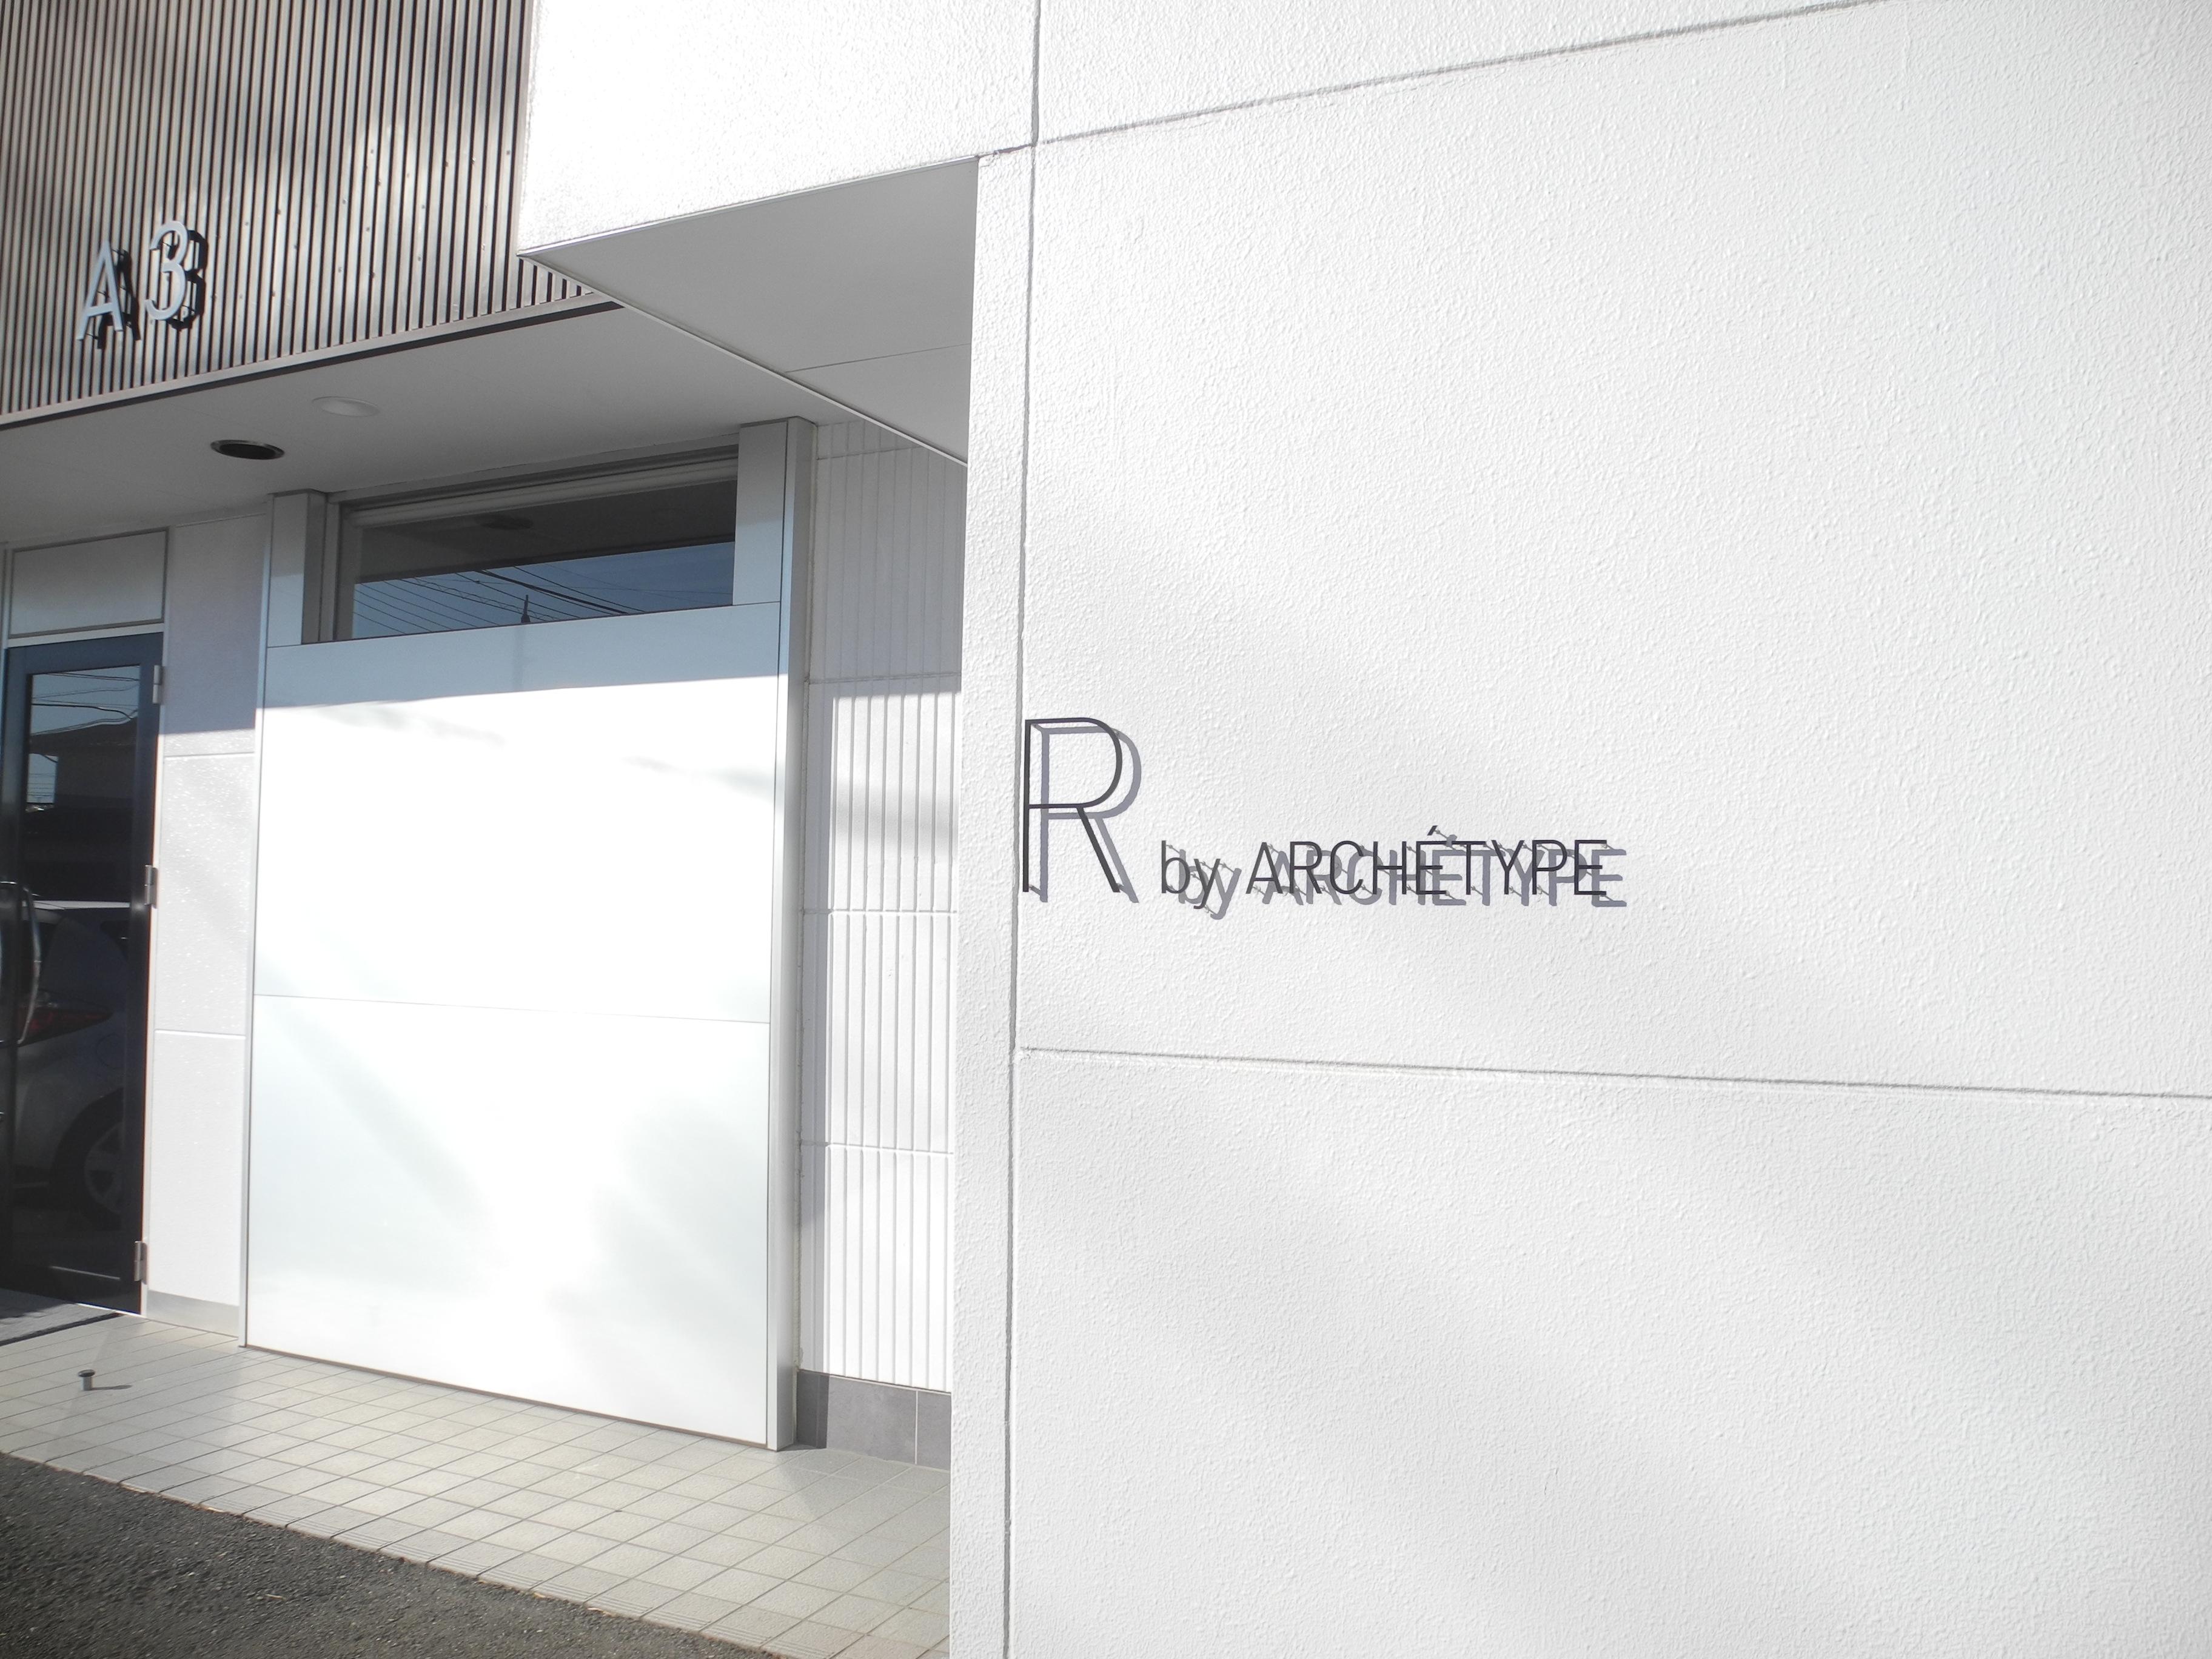 R by ARCHETEPE